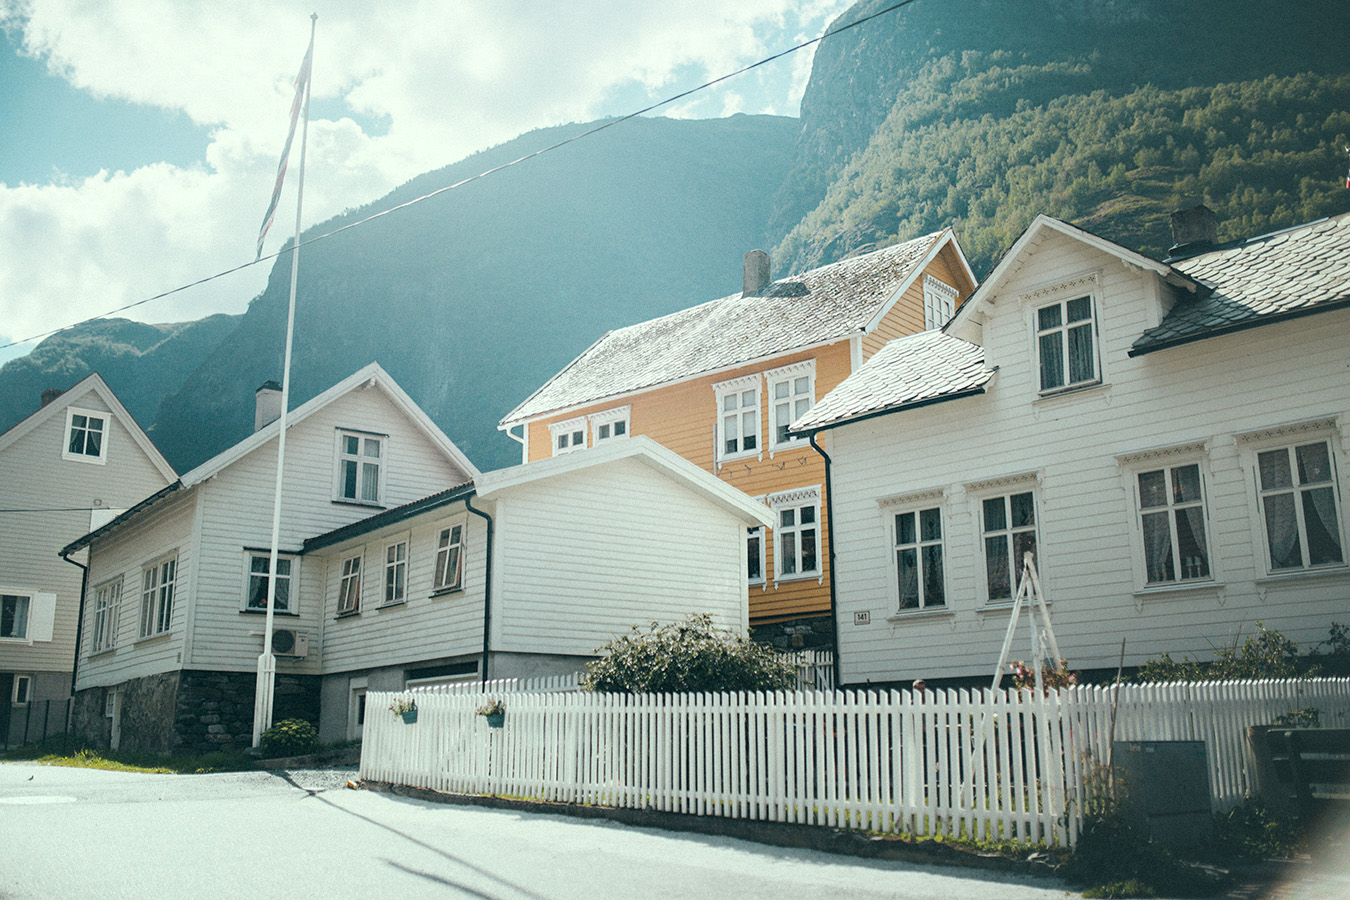 domki w Undredal, Norwegia